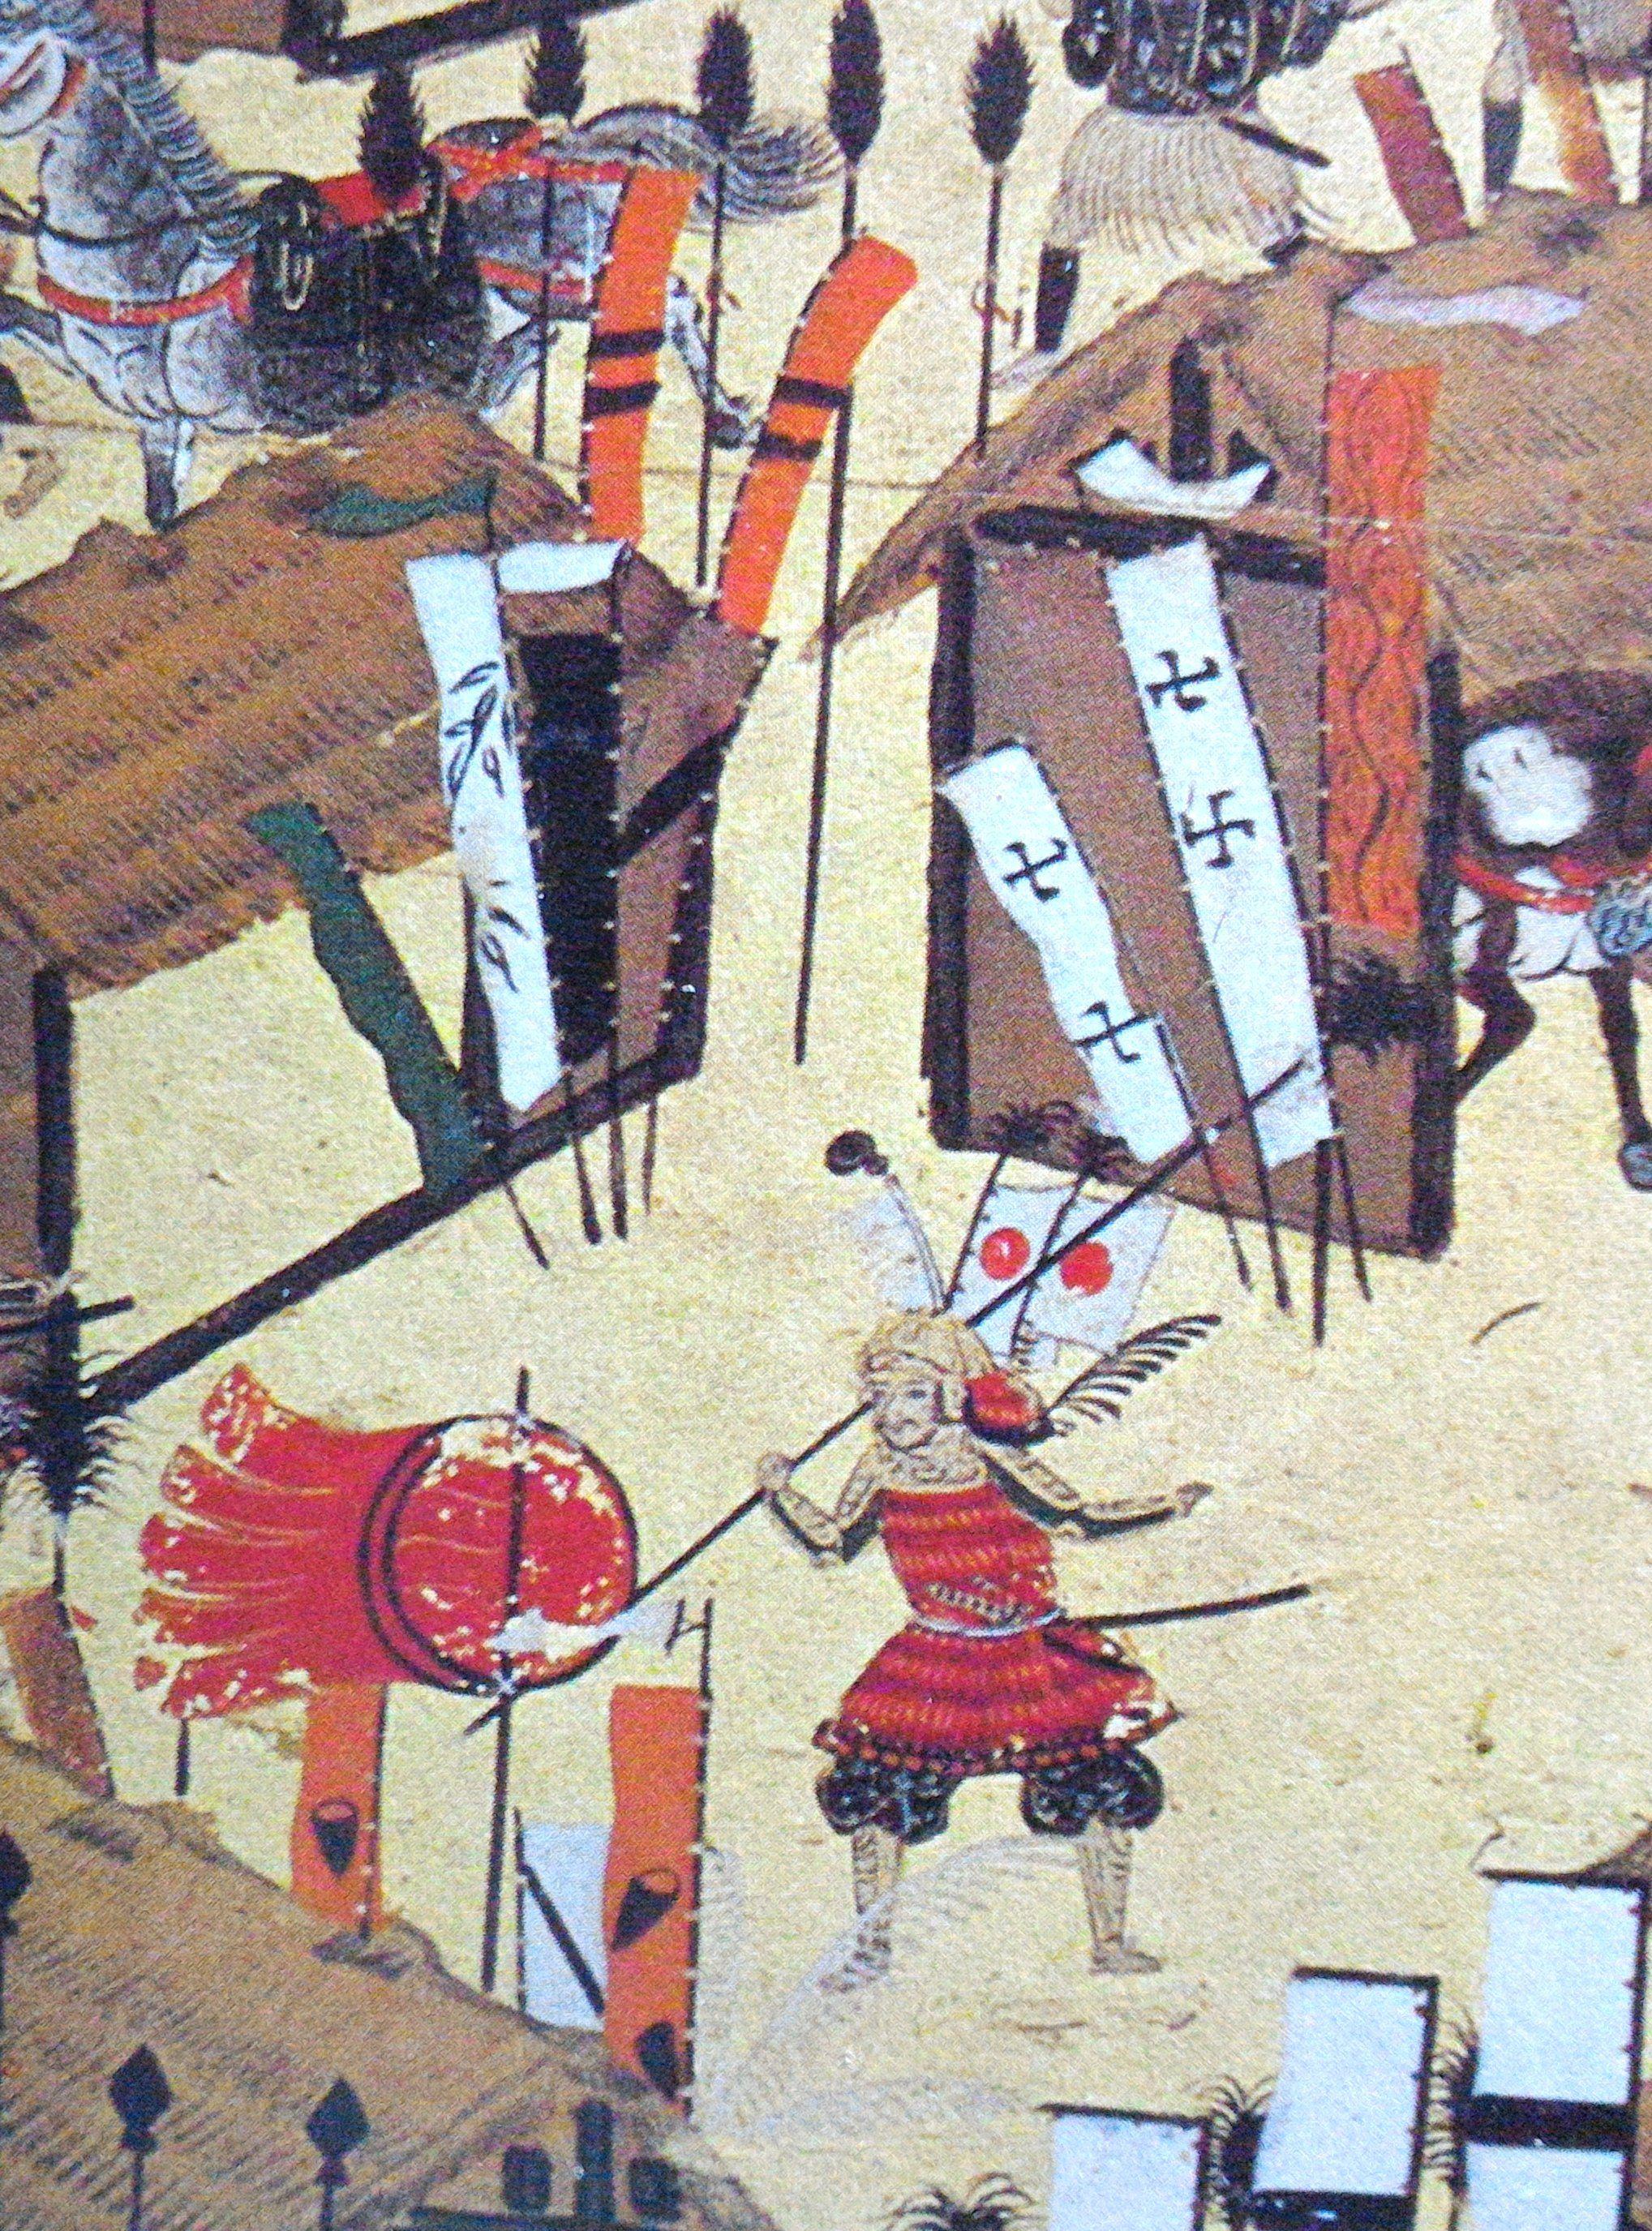 Samurai の画像 投稿者 Alessandro Gigli さん 武具 日本